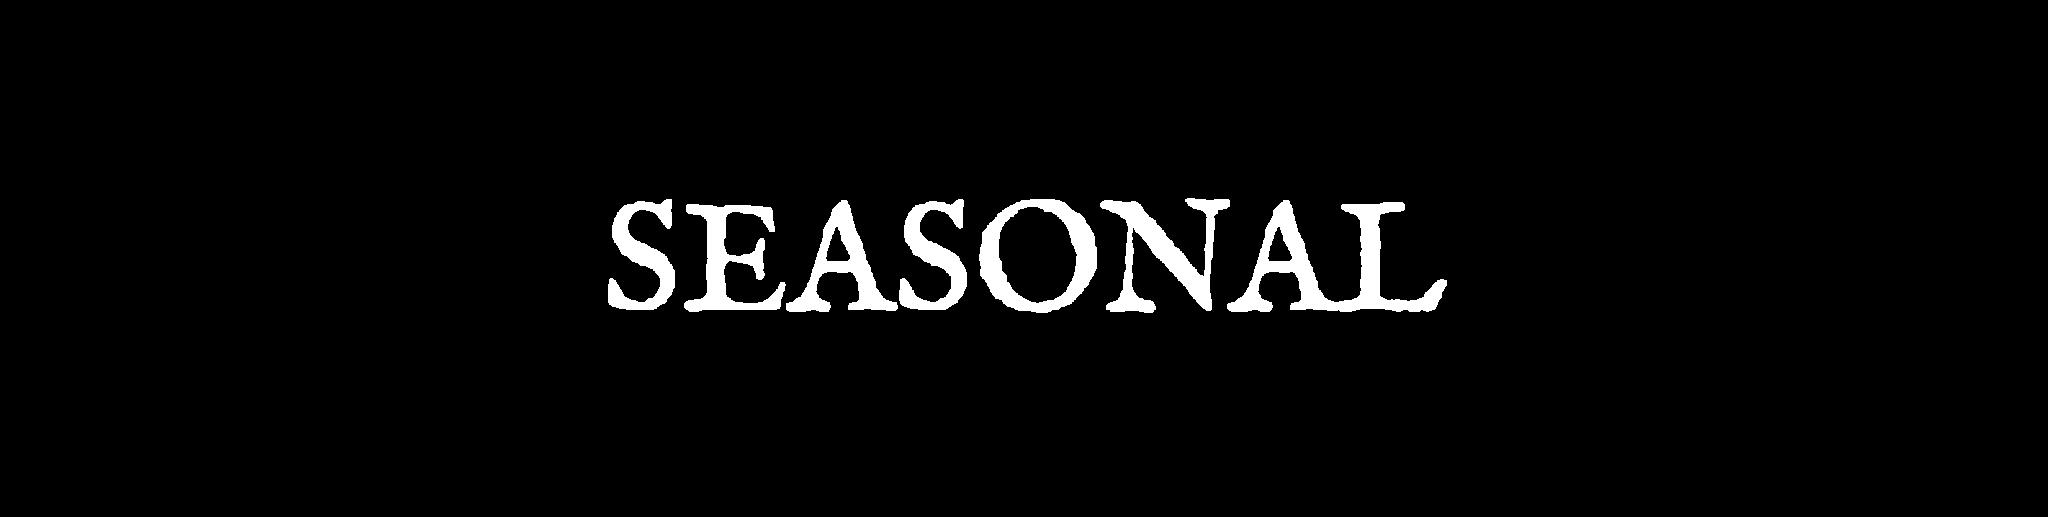 SEASONAL-01